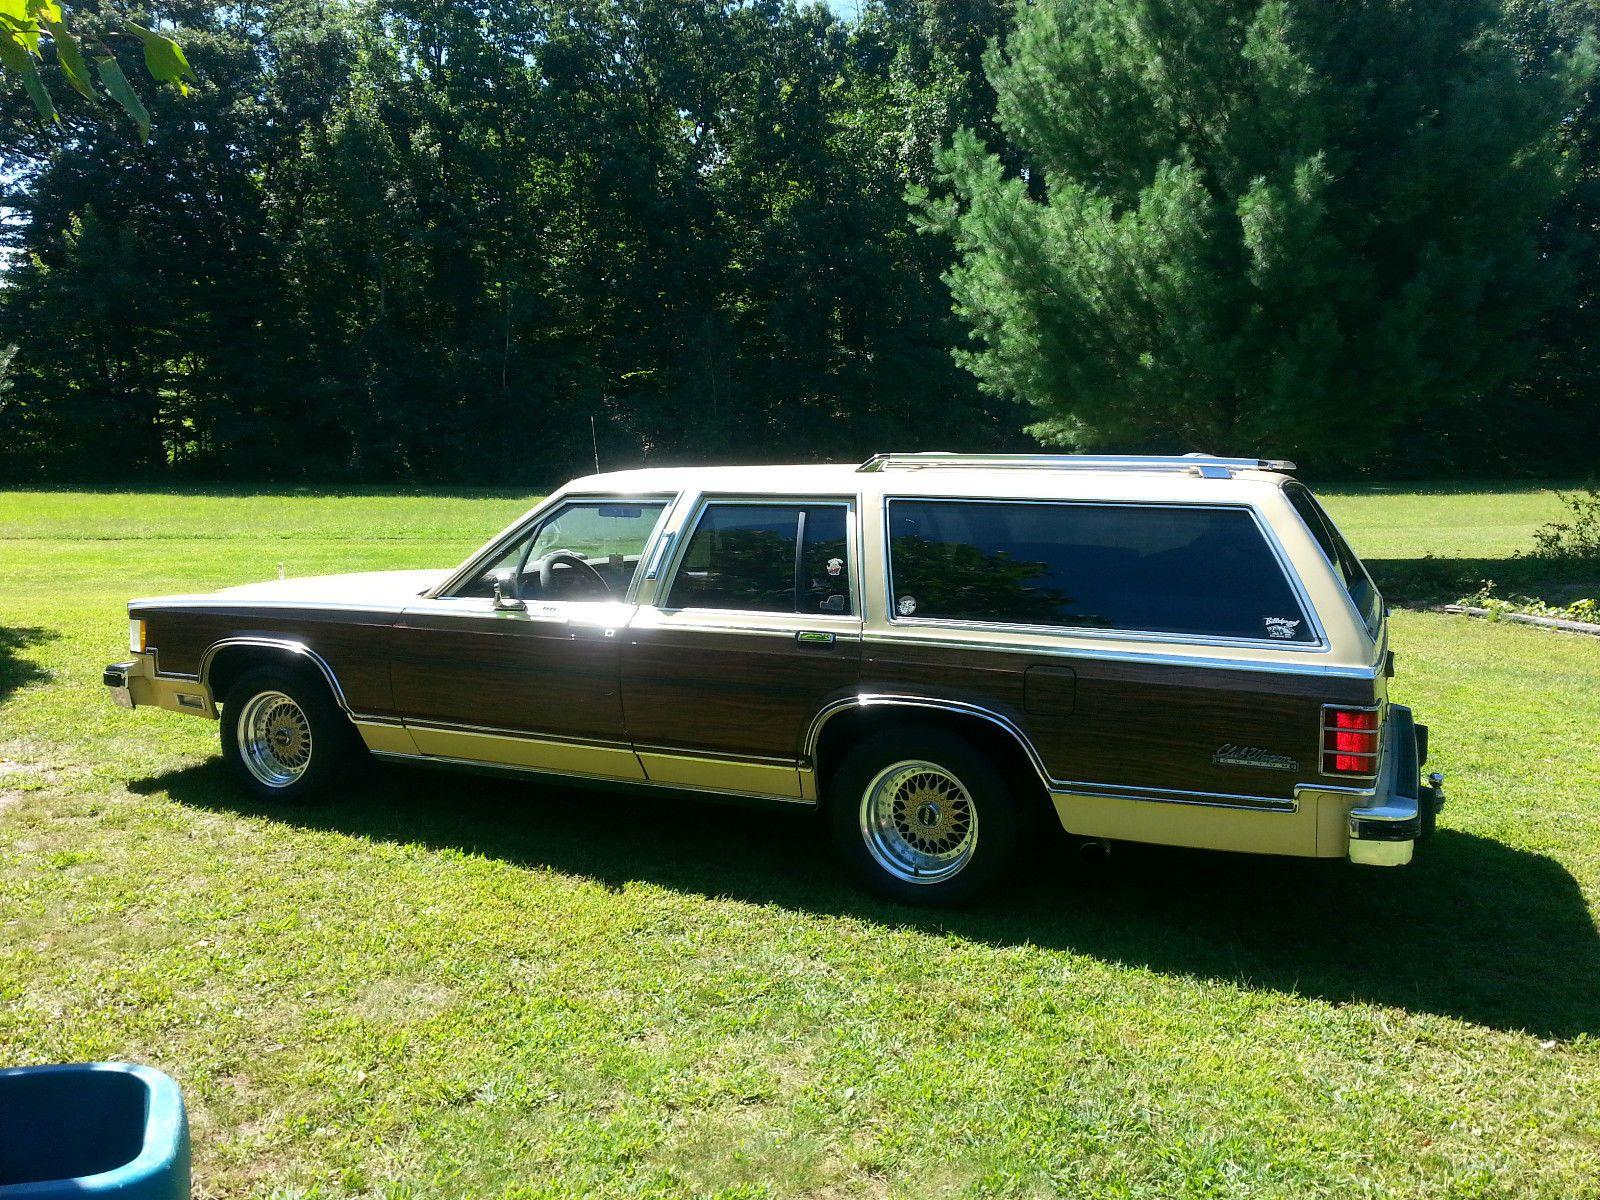 '81 Mercury Woody Grand Marquis Colony Park Wagon